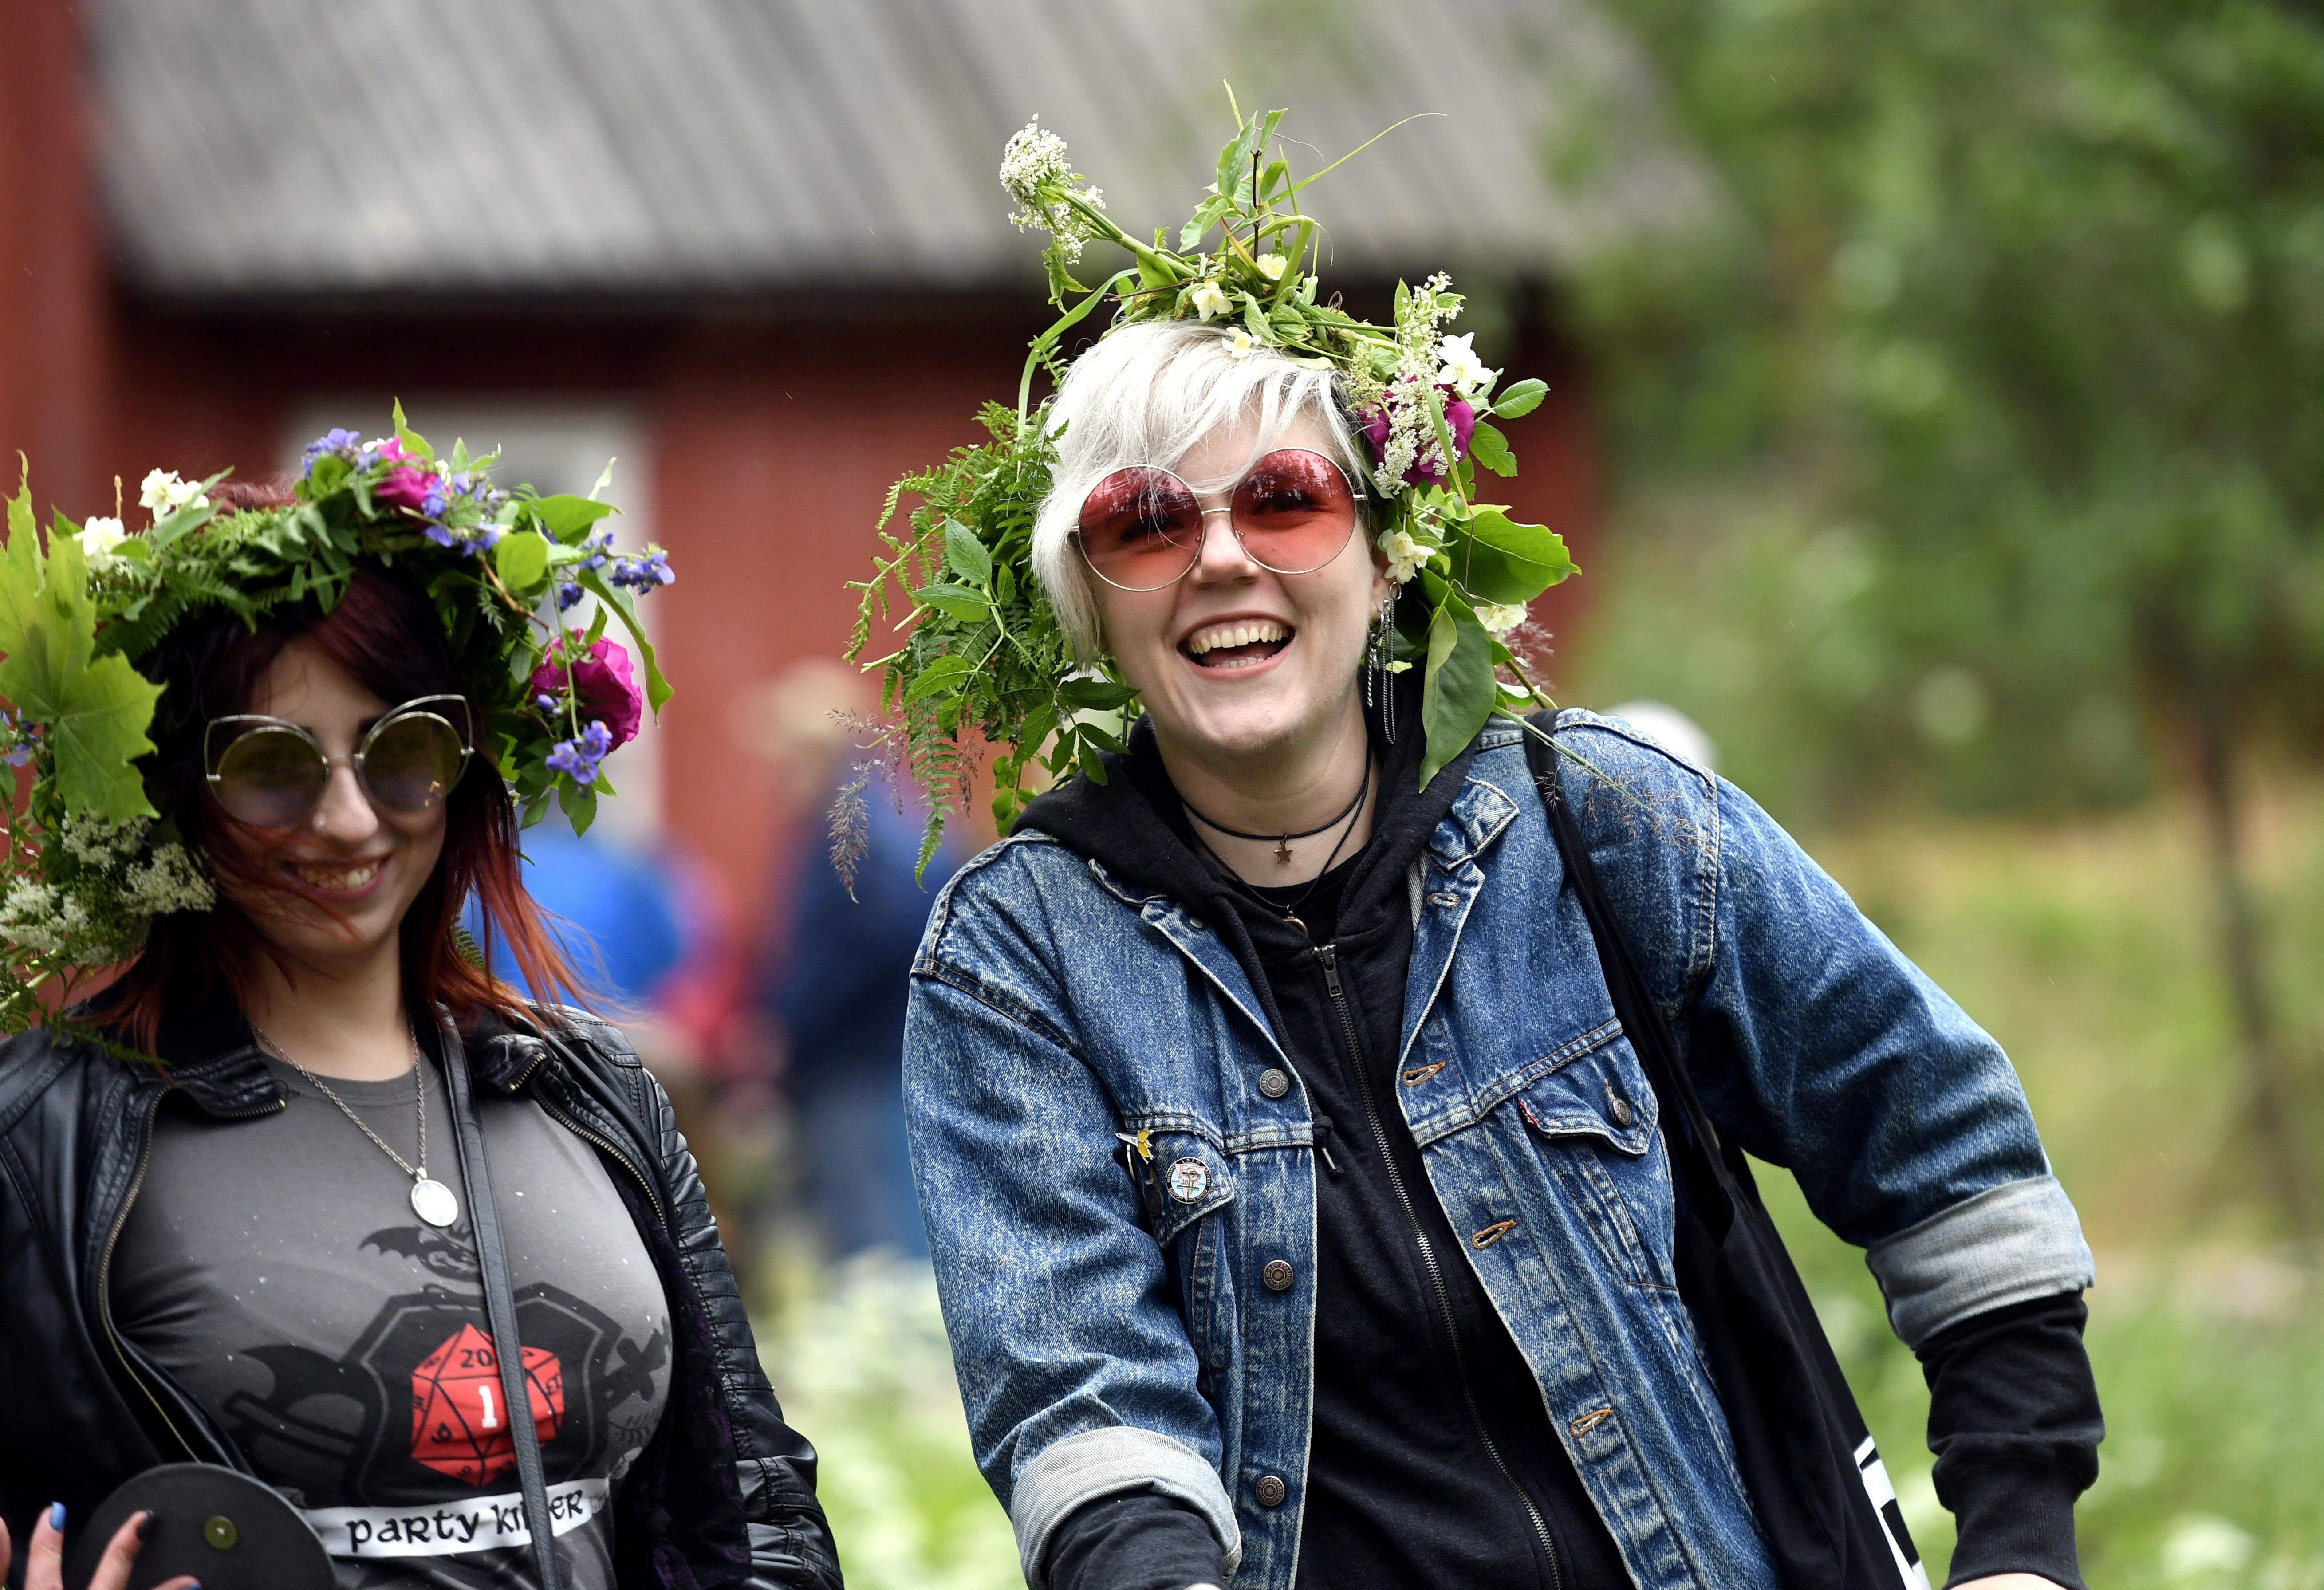 FILE PHOTO: Girls wearing flower garlands celebrate the summer solstice during the Seurasaari open-air museum's Midsummer Eve festival in Helsinki, Finland June 22, 2018. LEHTIKUVA / Heikki Saukkomaa via REUTERS/File Photo